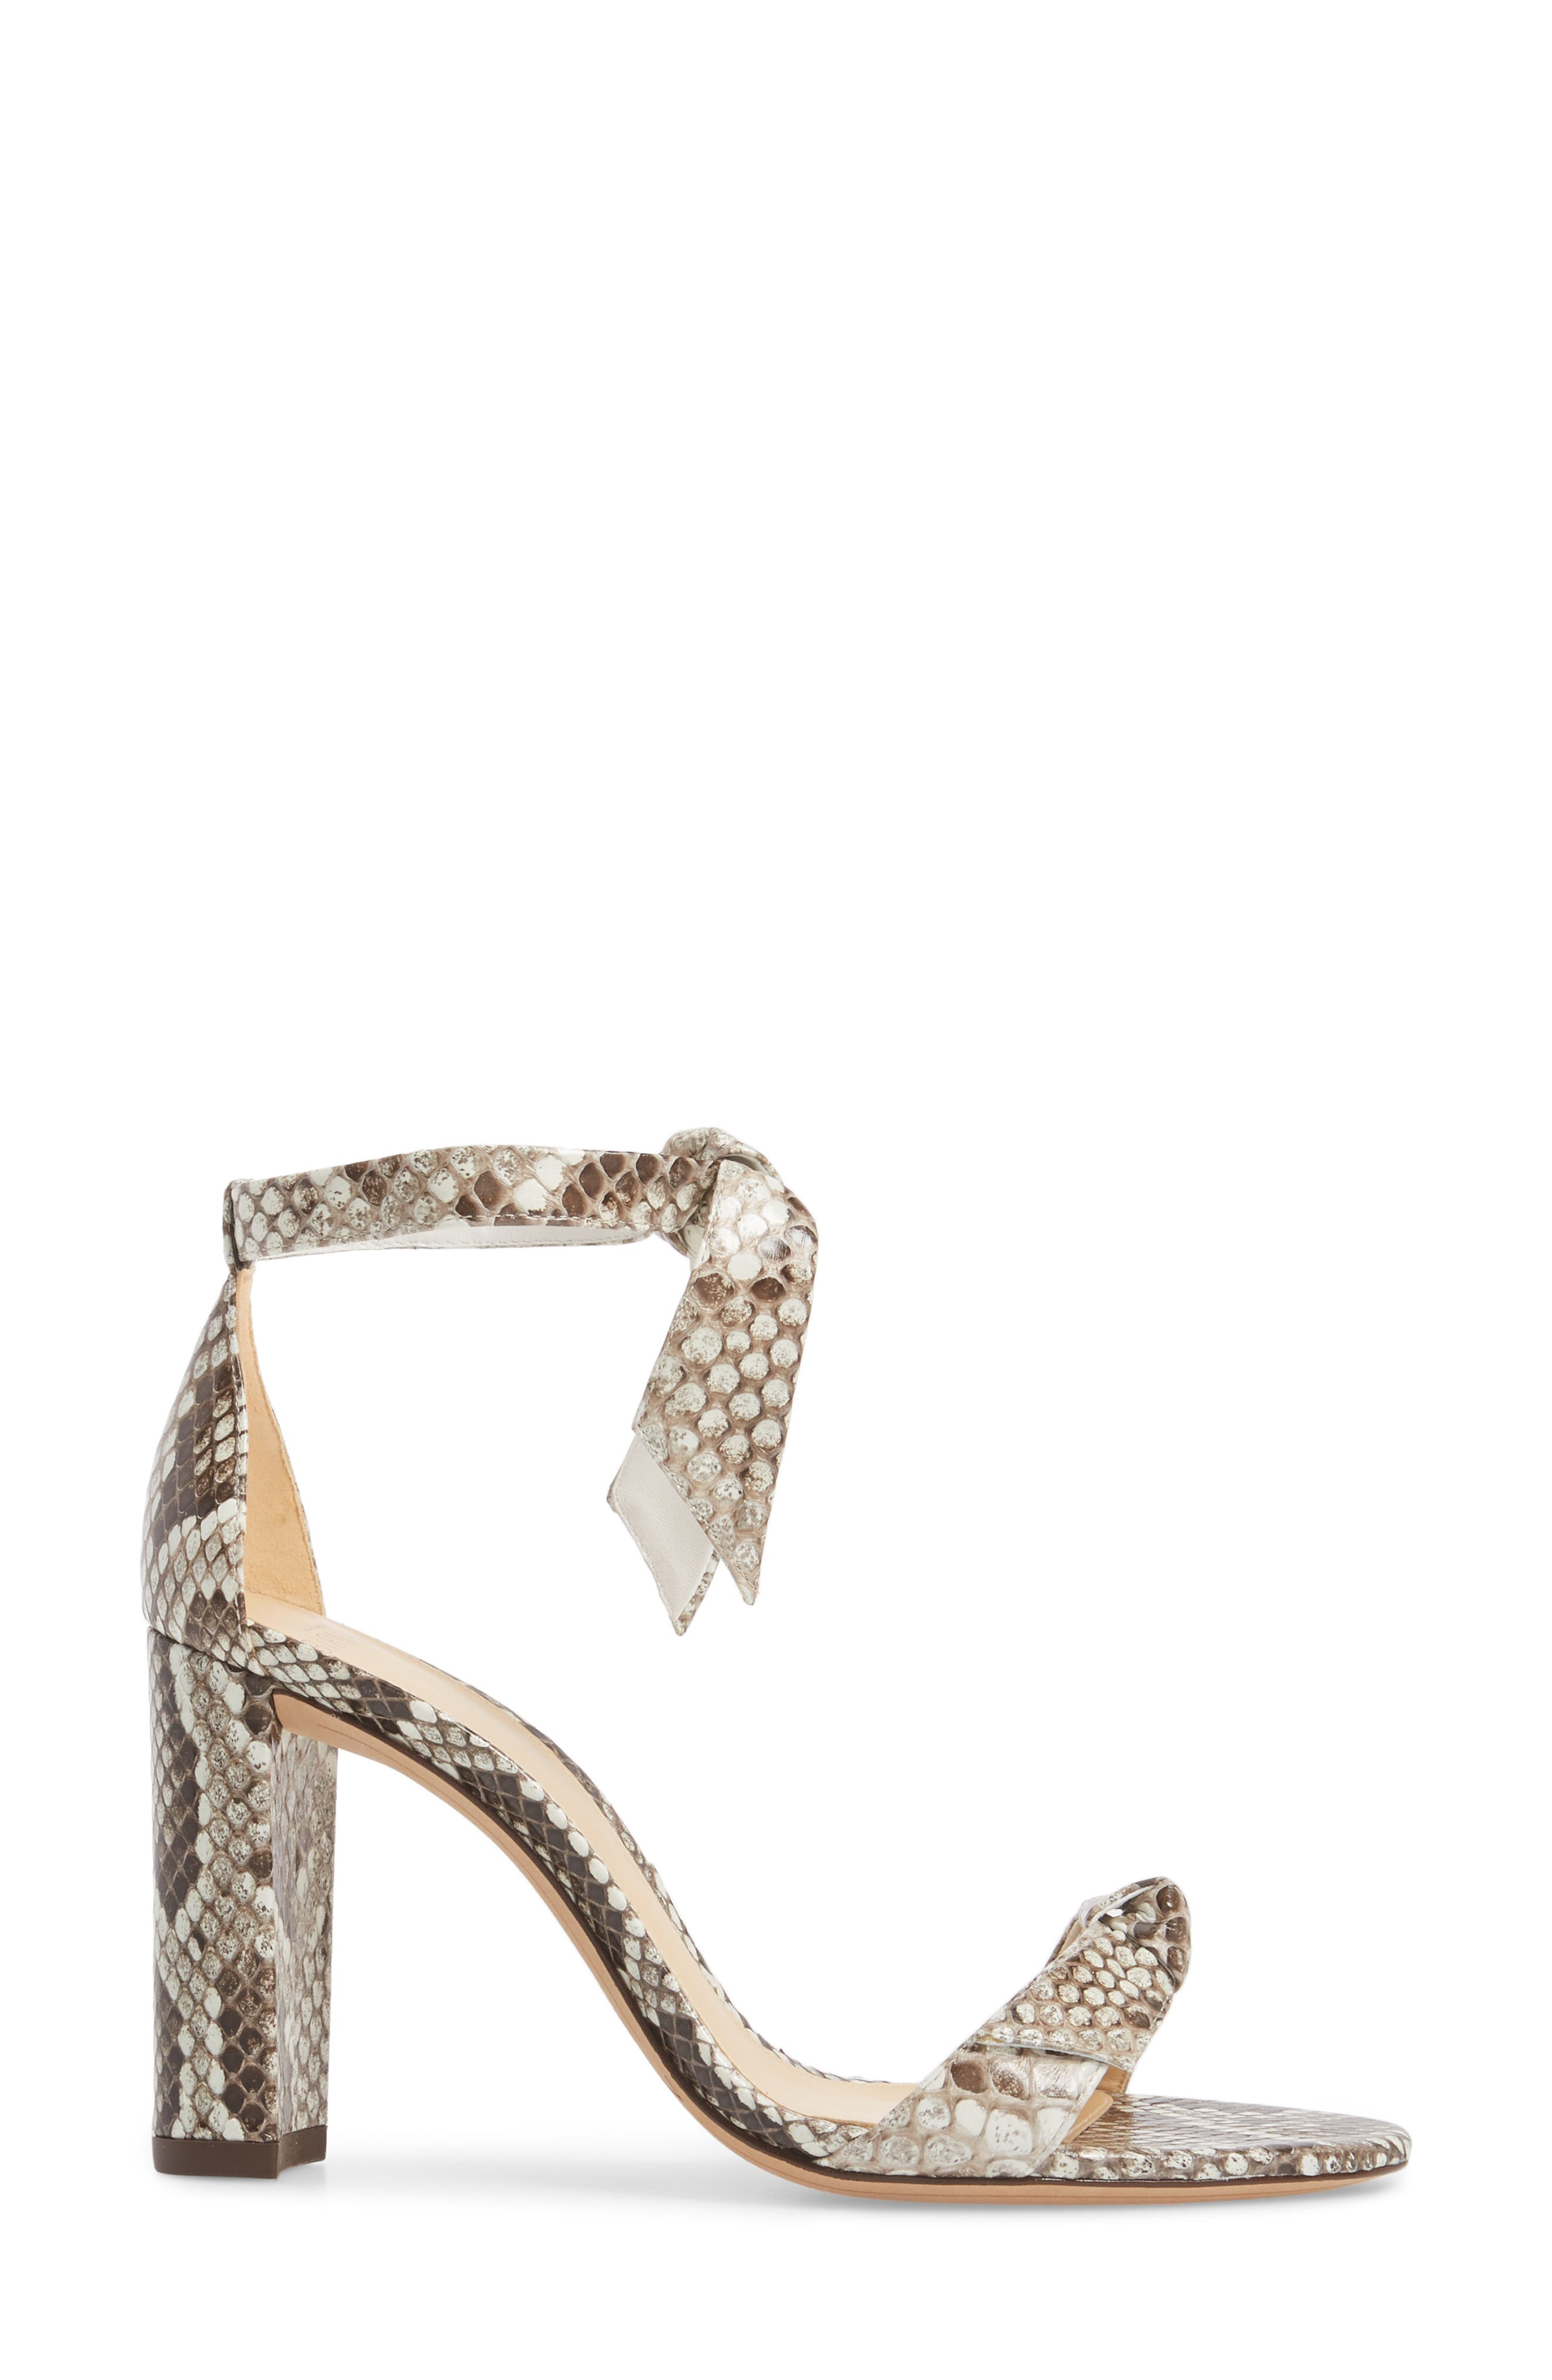 Clarita Genuine Python Ankle Tie Sandal,                             Alternate thumbnail 3, color,                             Natural